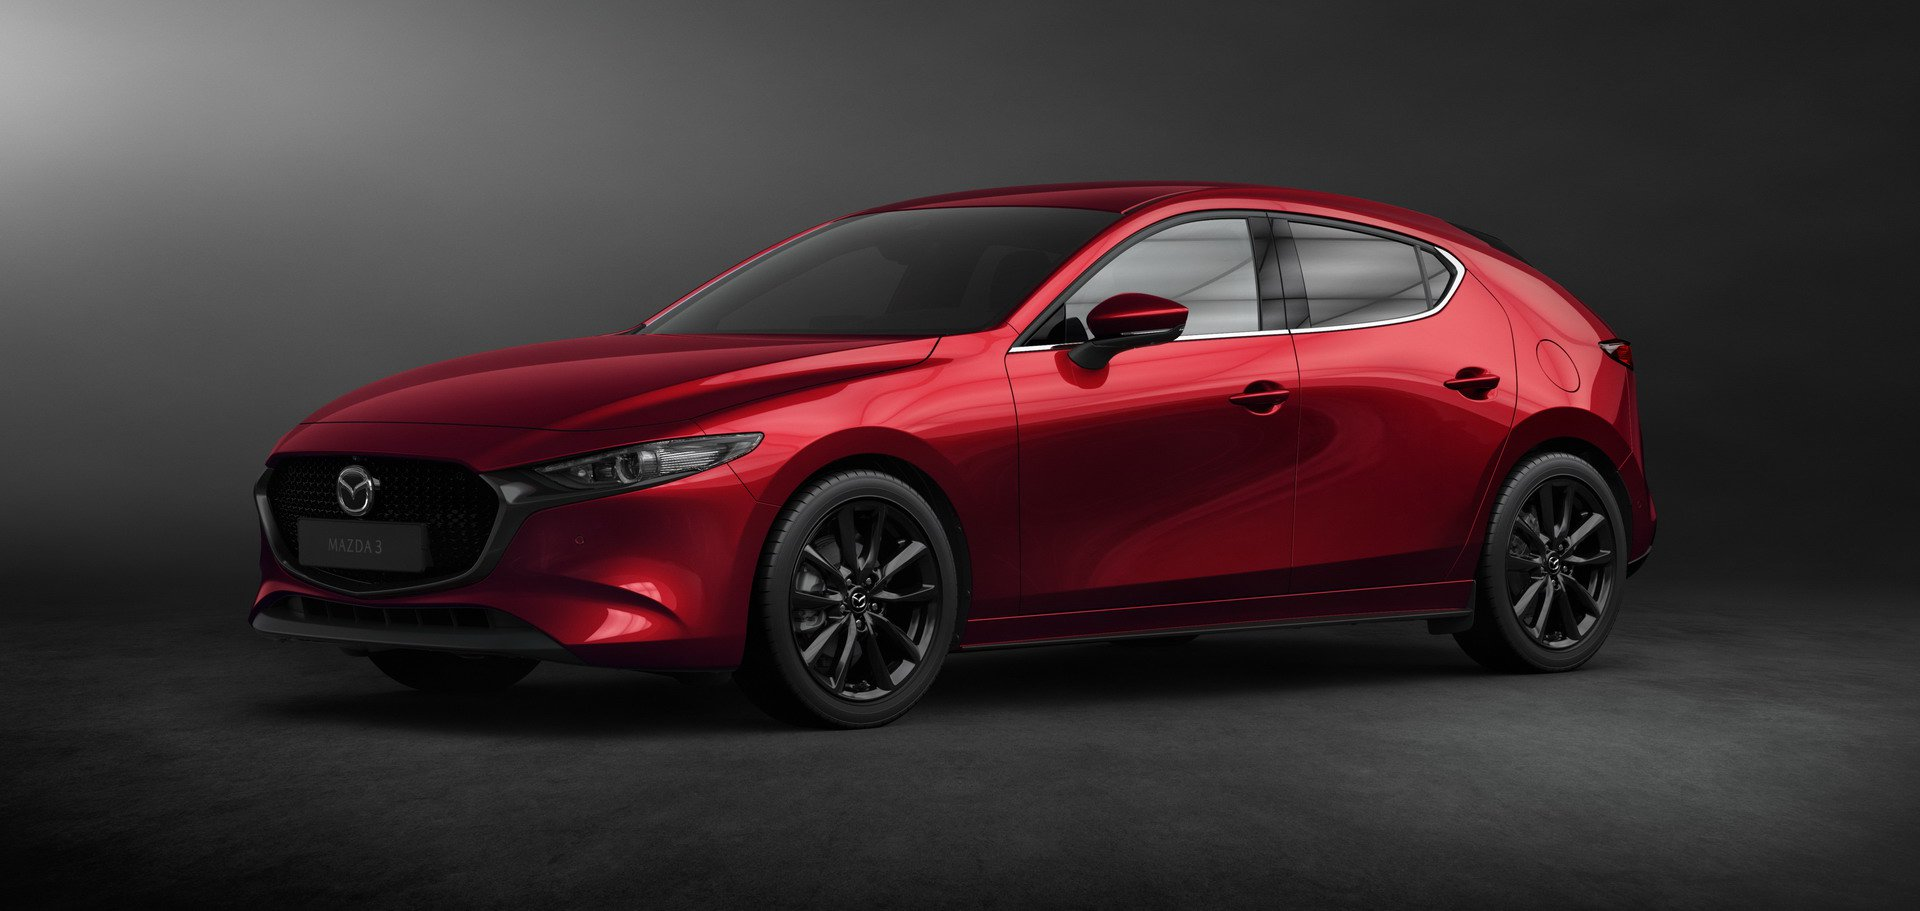 Kelebihan Mazda 3 Skyactiv G Harga